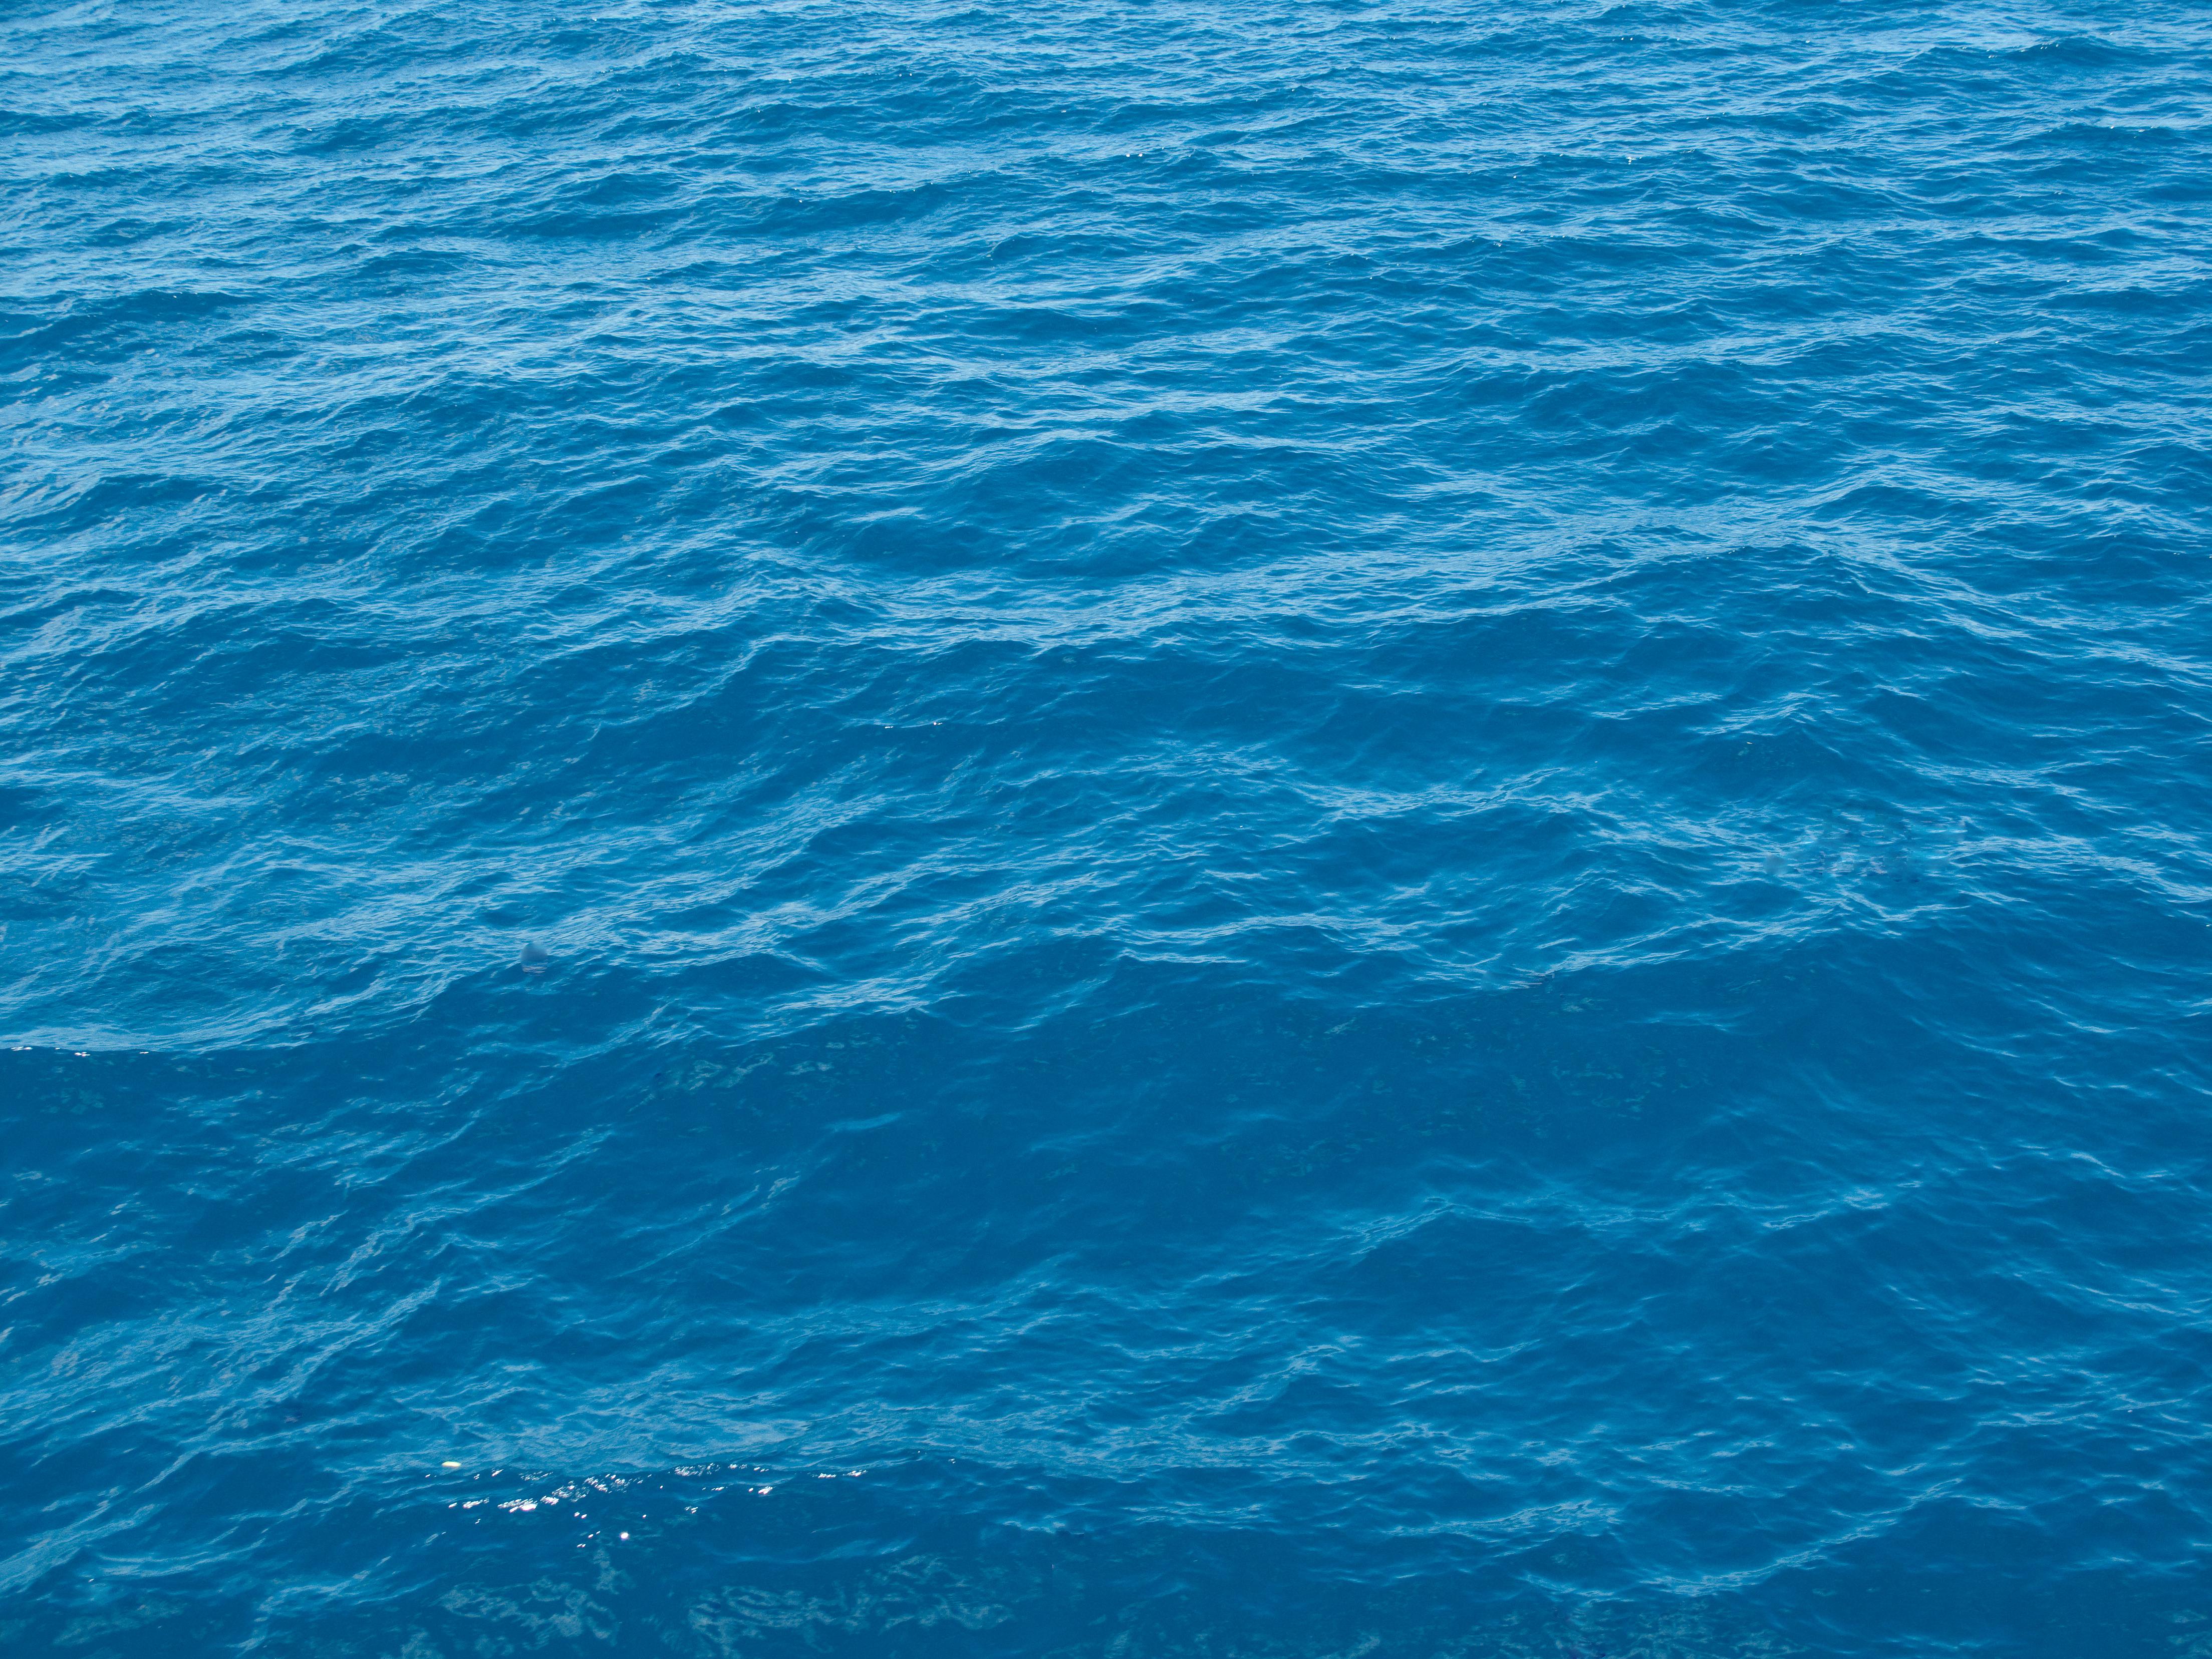 File:Blue water, Lake Tahoe.jpg - Wikimedia Commons